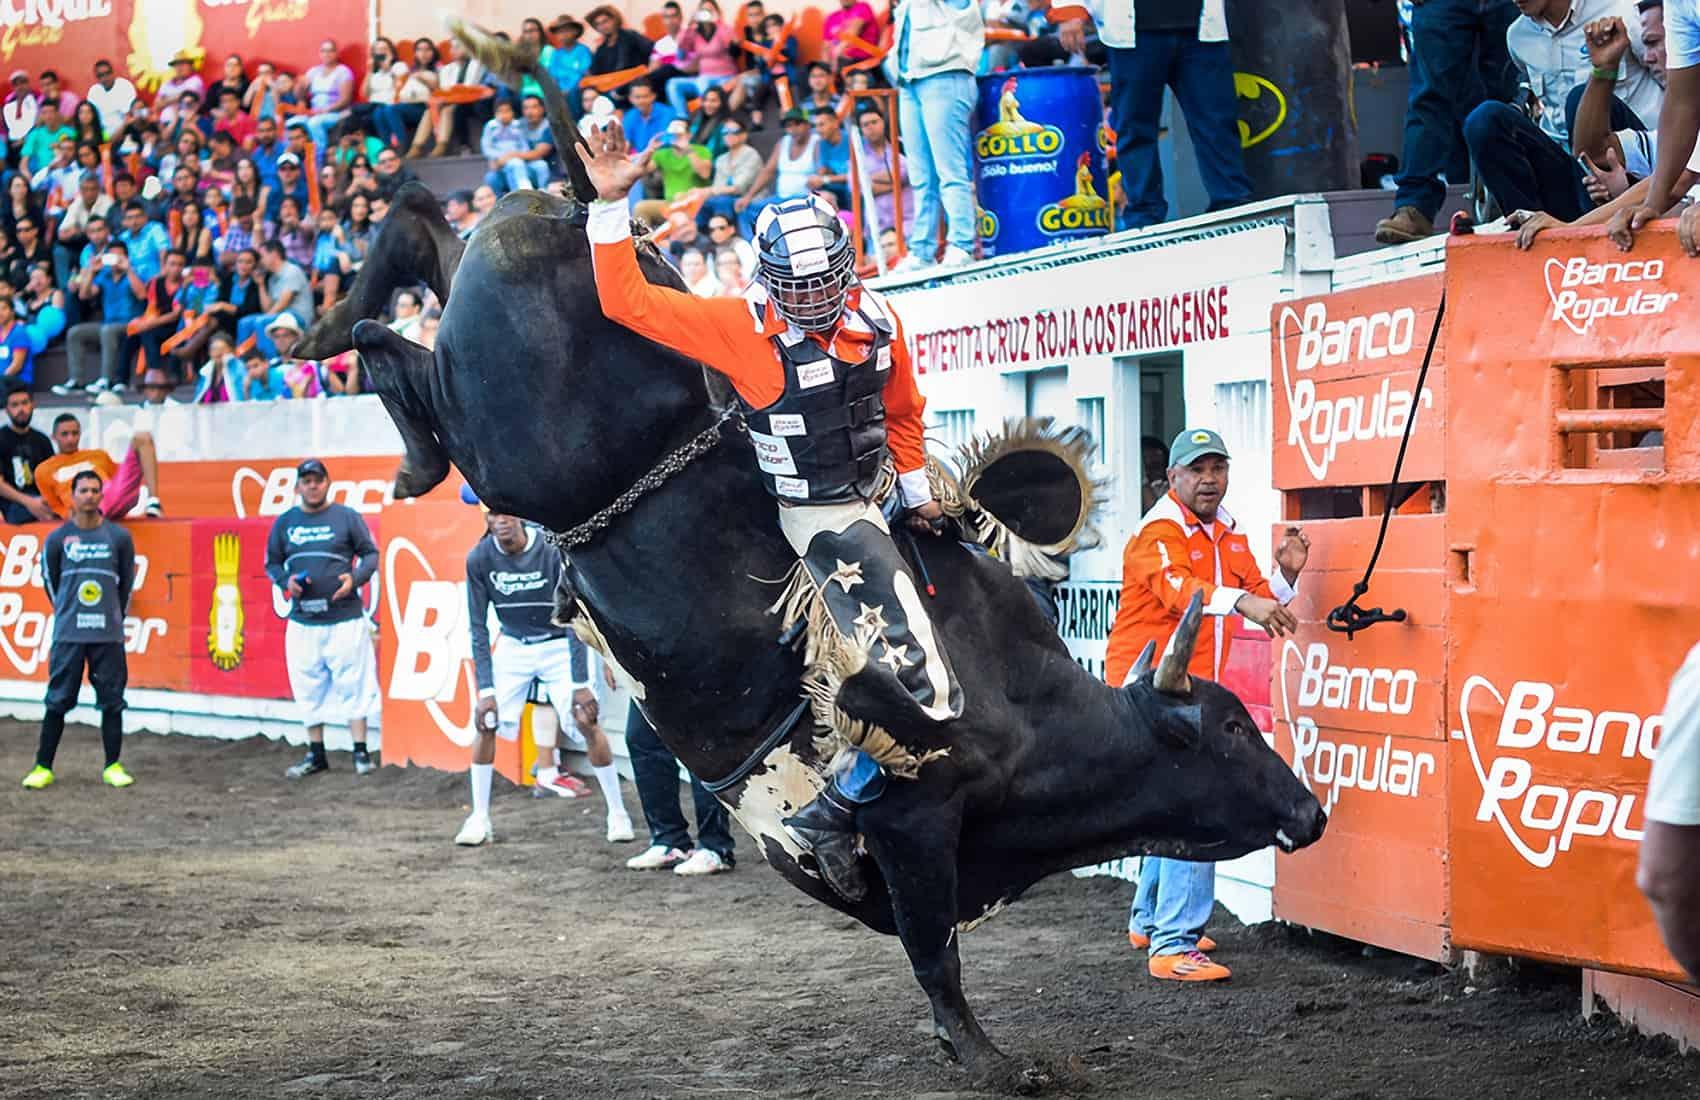 Tico-style bullfights